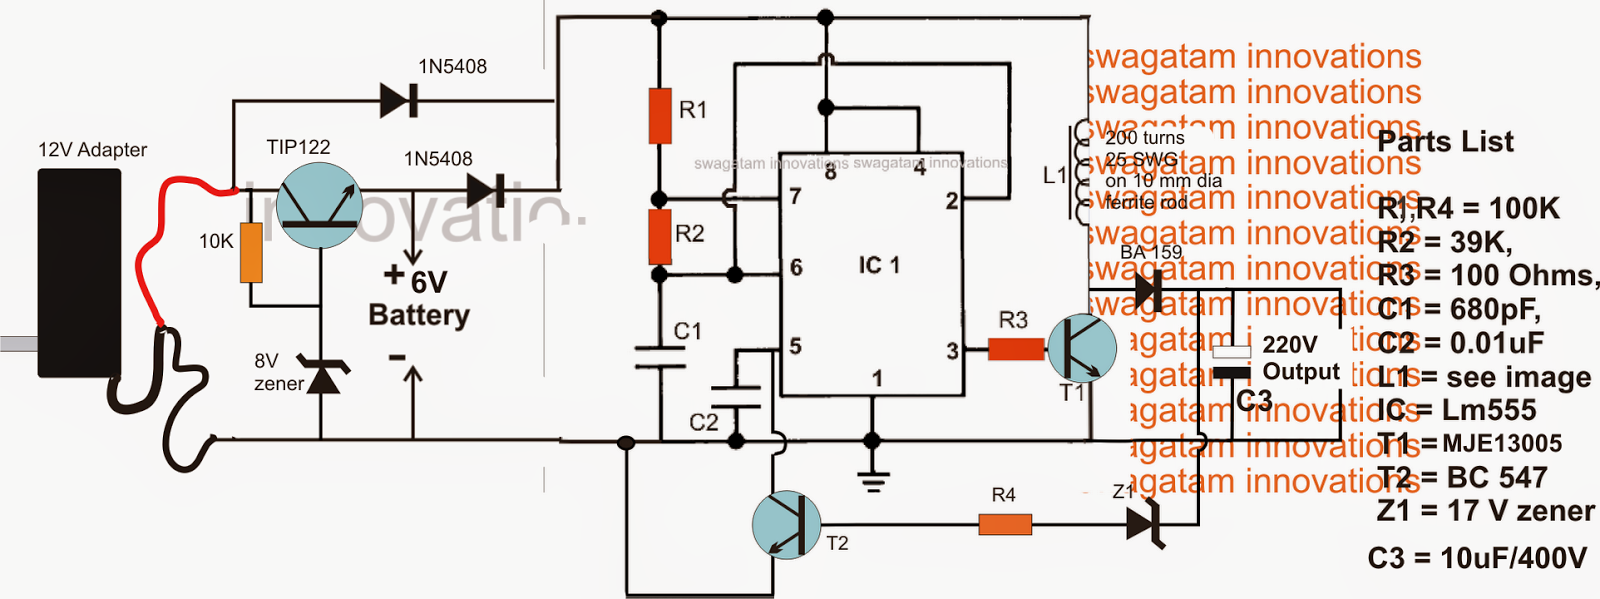 6 volt inverter circuit diagram wiring diagram img 6 volt inverter circuit diagram 6 volt inverter circuit diagram [ 1600 x 599 Pixel ]